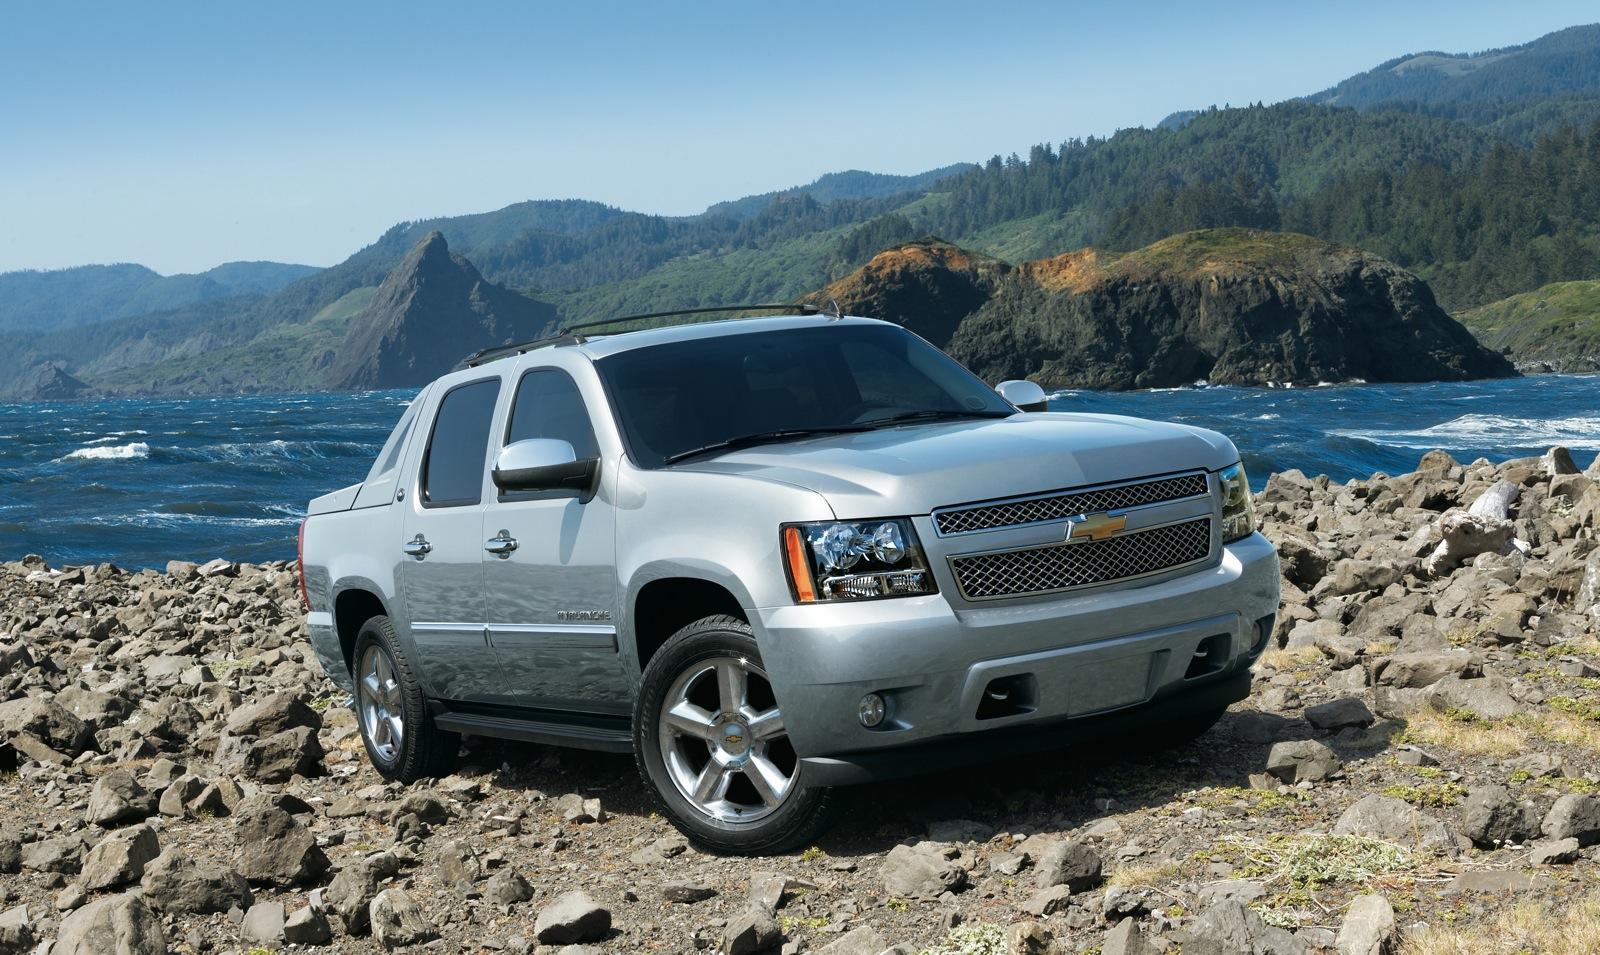 Kelebihan Chevrolet Avalanche Harga